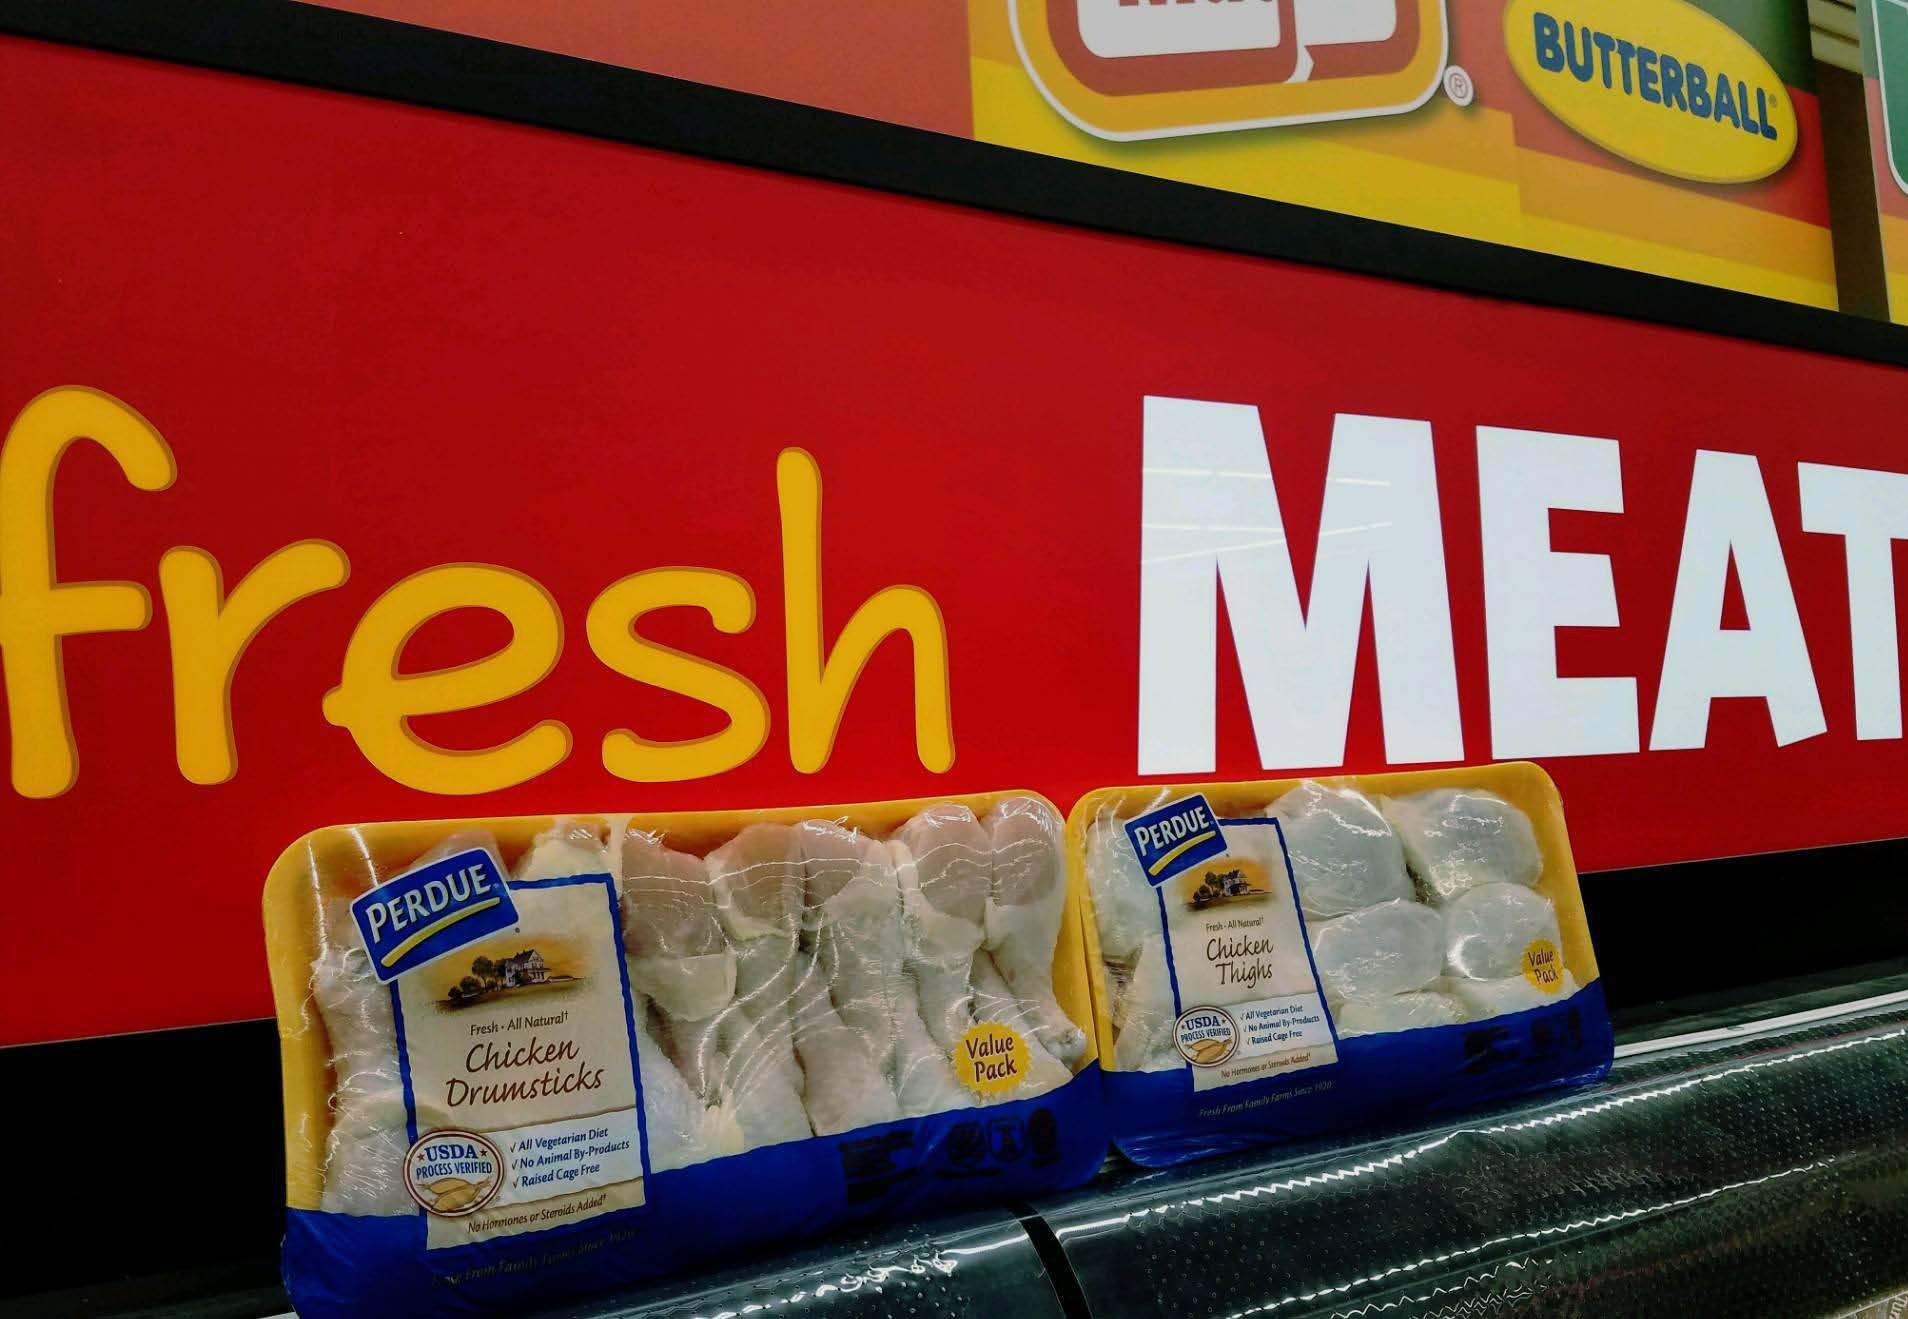 discount, groceries, bargain, meats, vegetables, milk, bread, deli, market, outlet